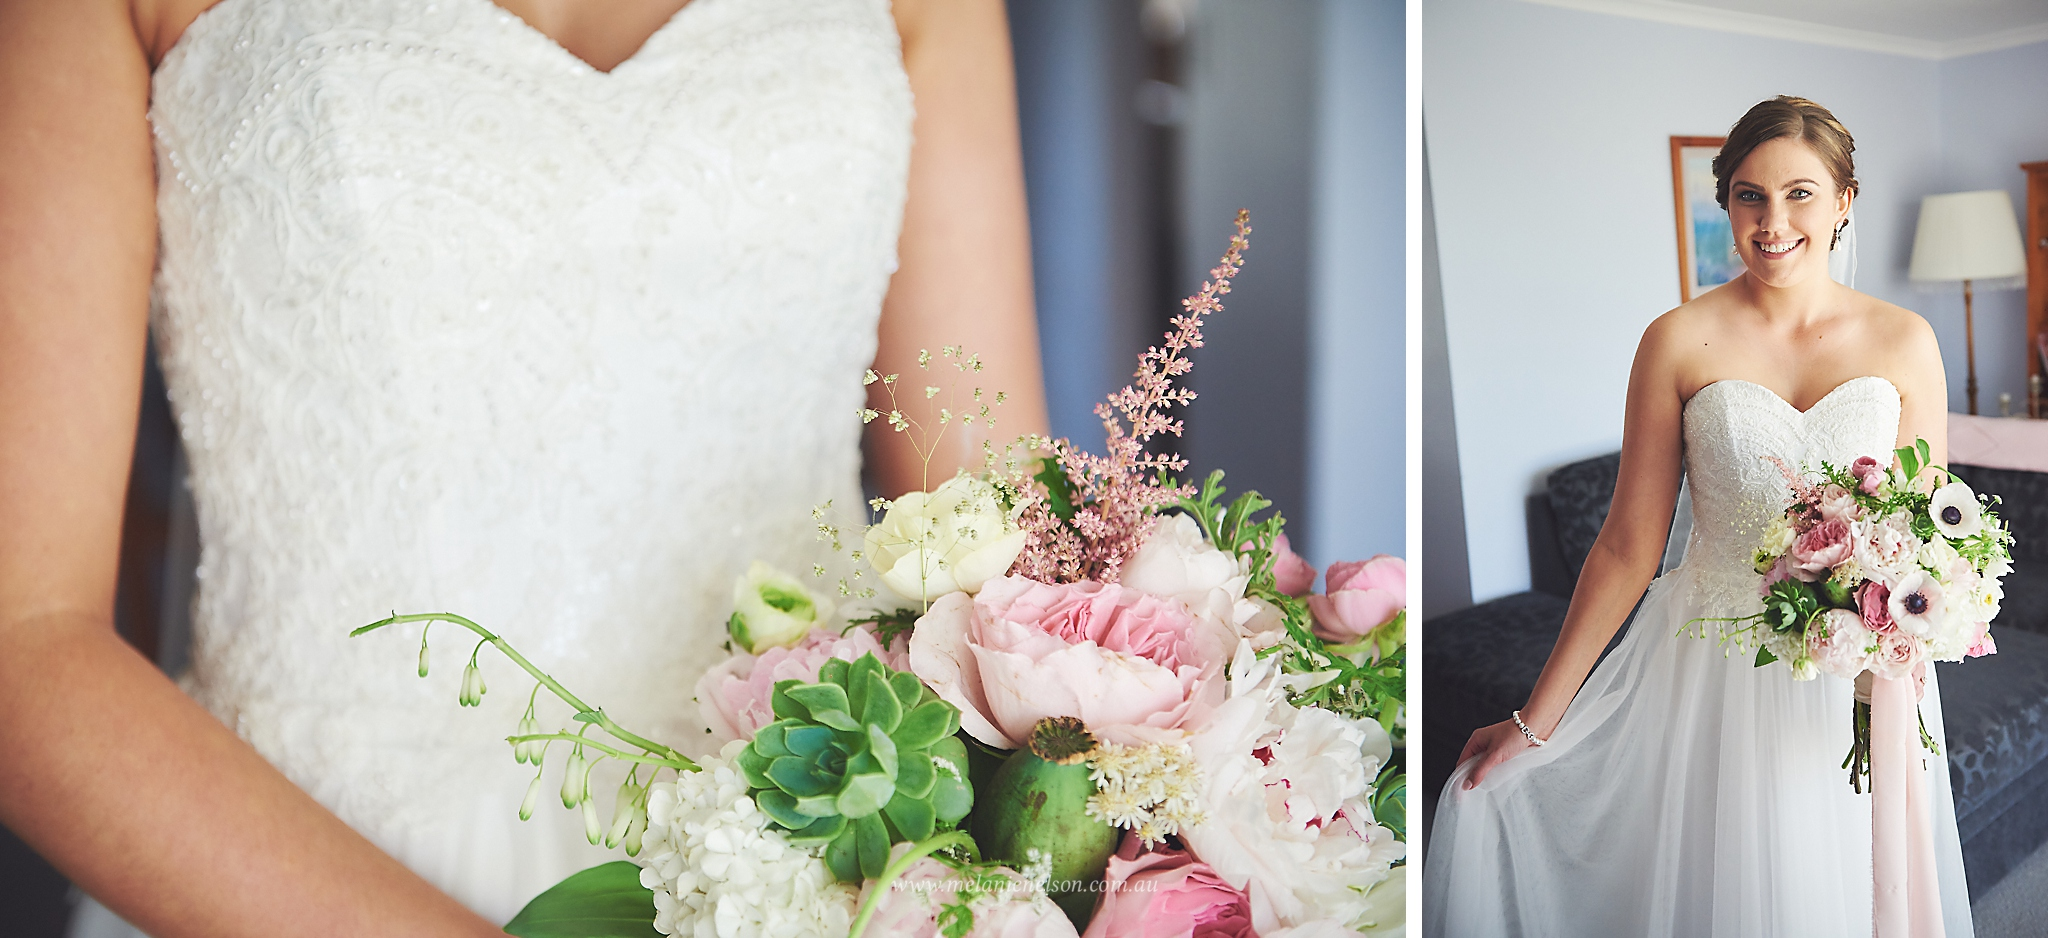 adelaide_hills_wedding_0011.jpg